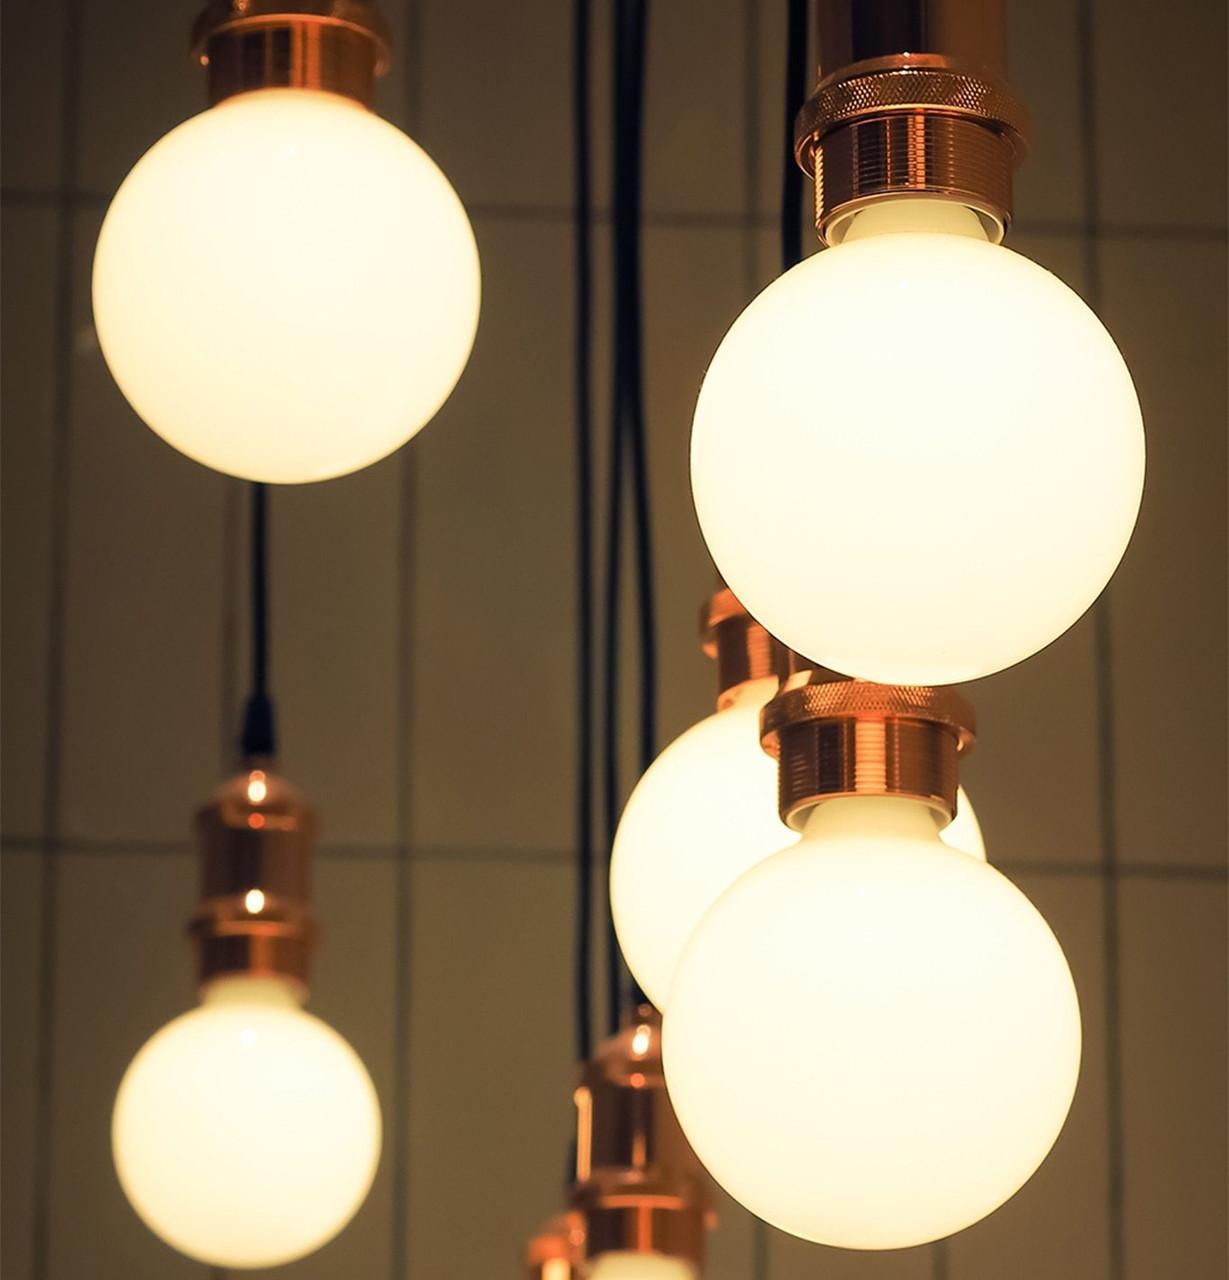 LED Globe Opal Light Bulbs